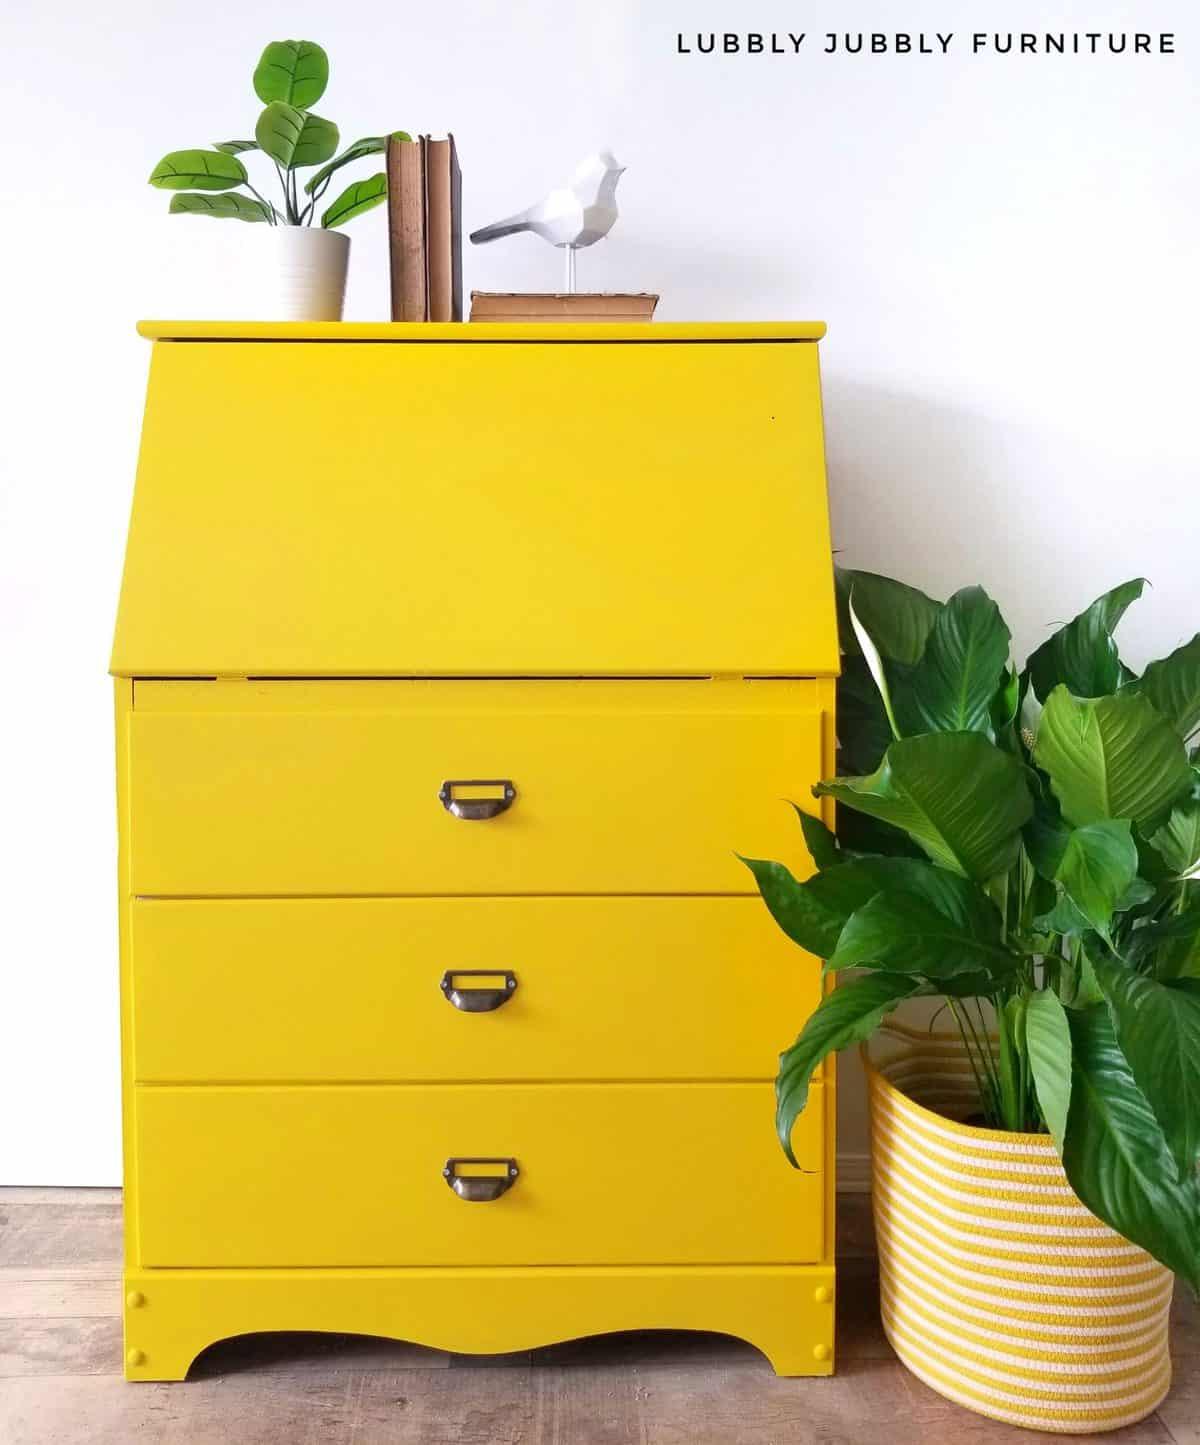 Bright lemon yellow painted secretary desk